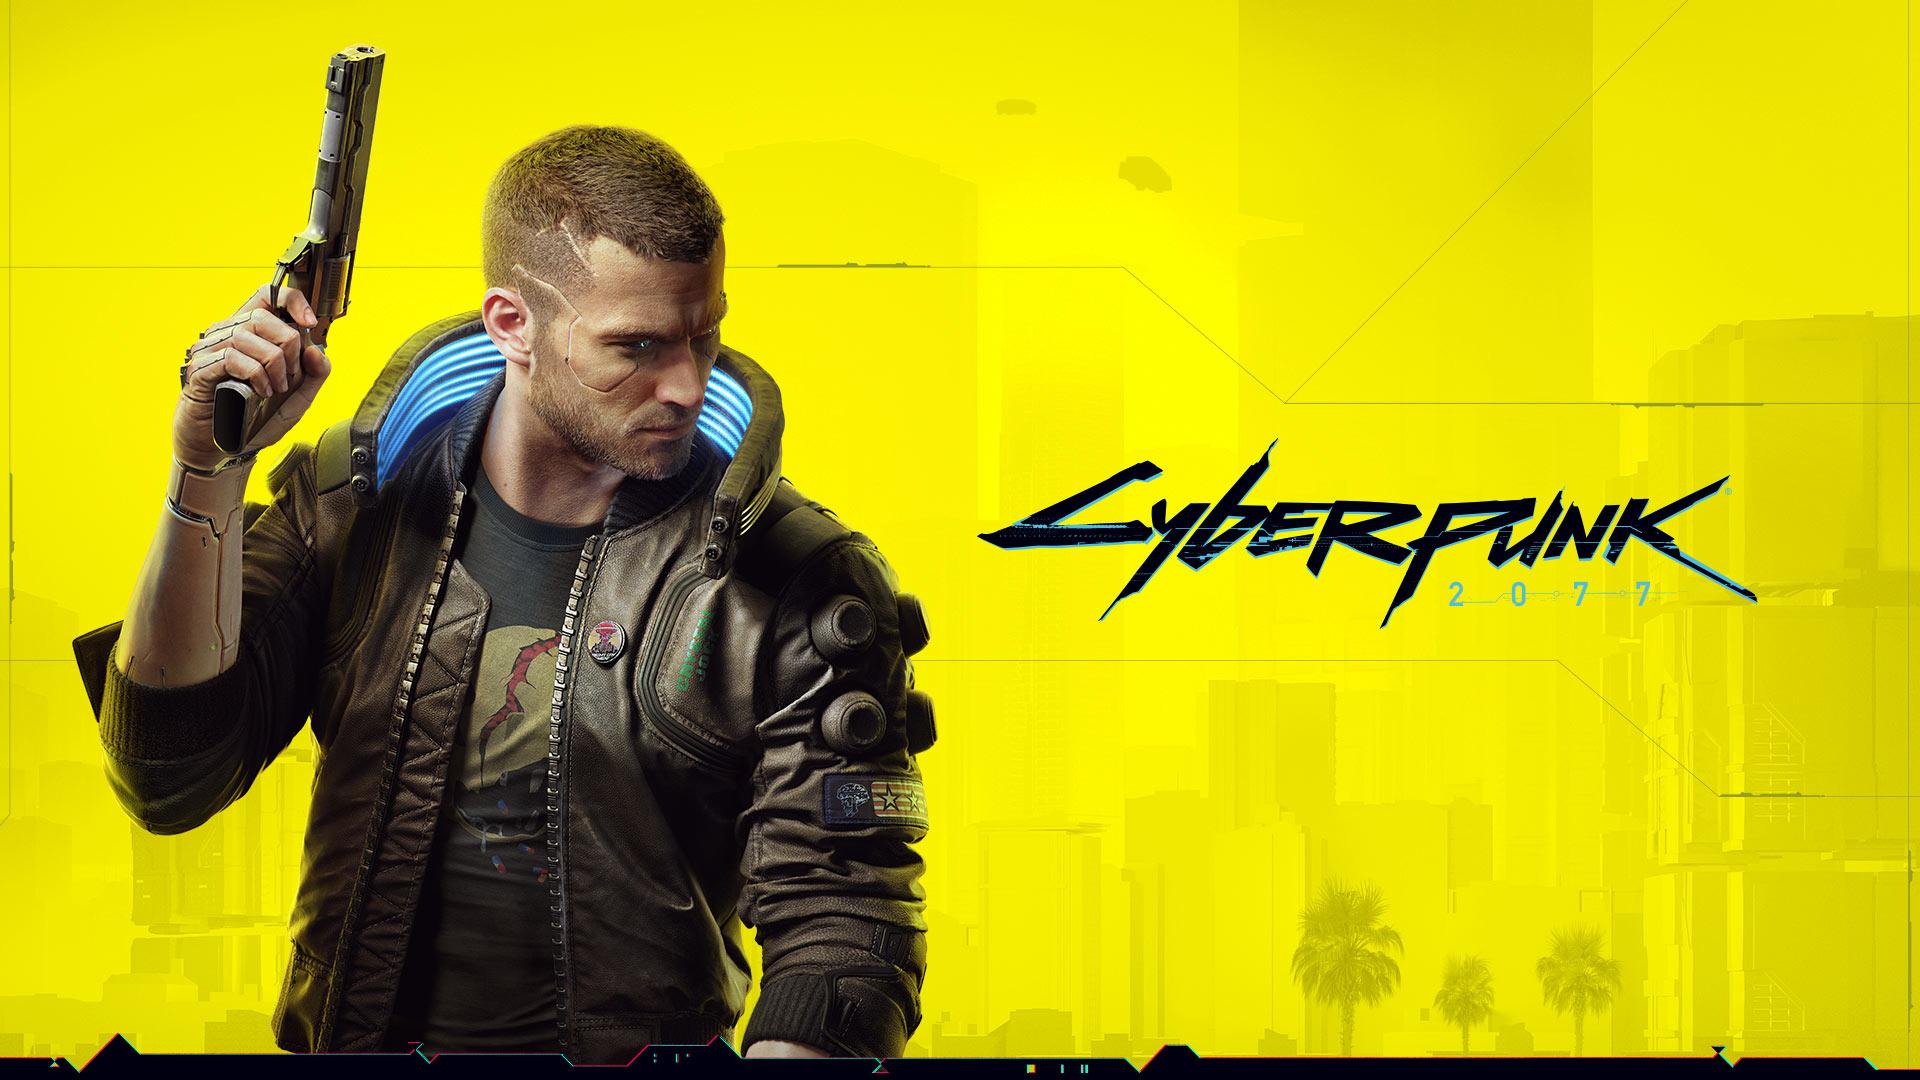 Cyberpunk 2077 promotional image